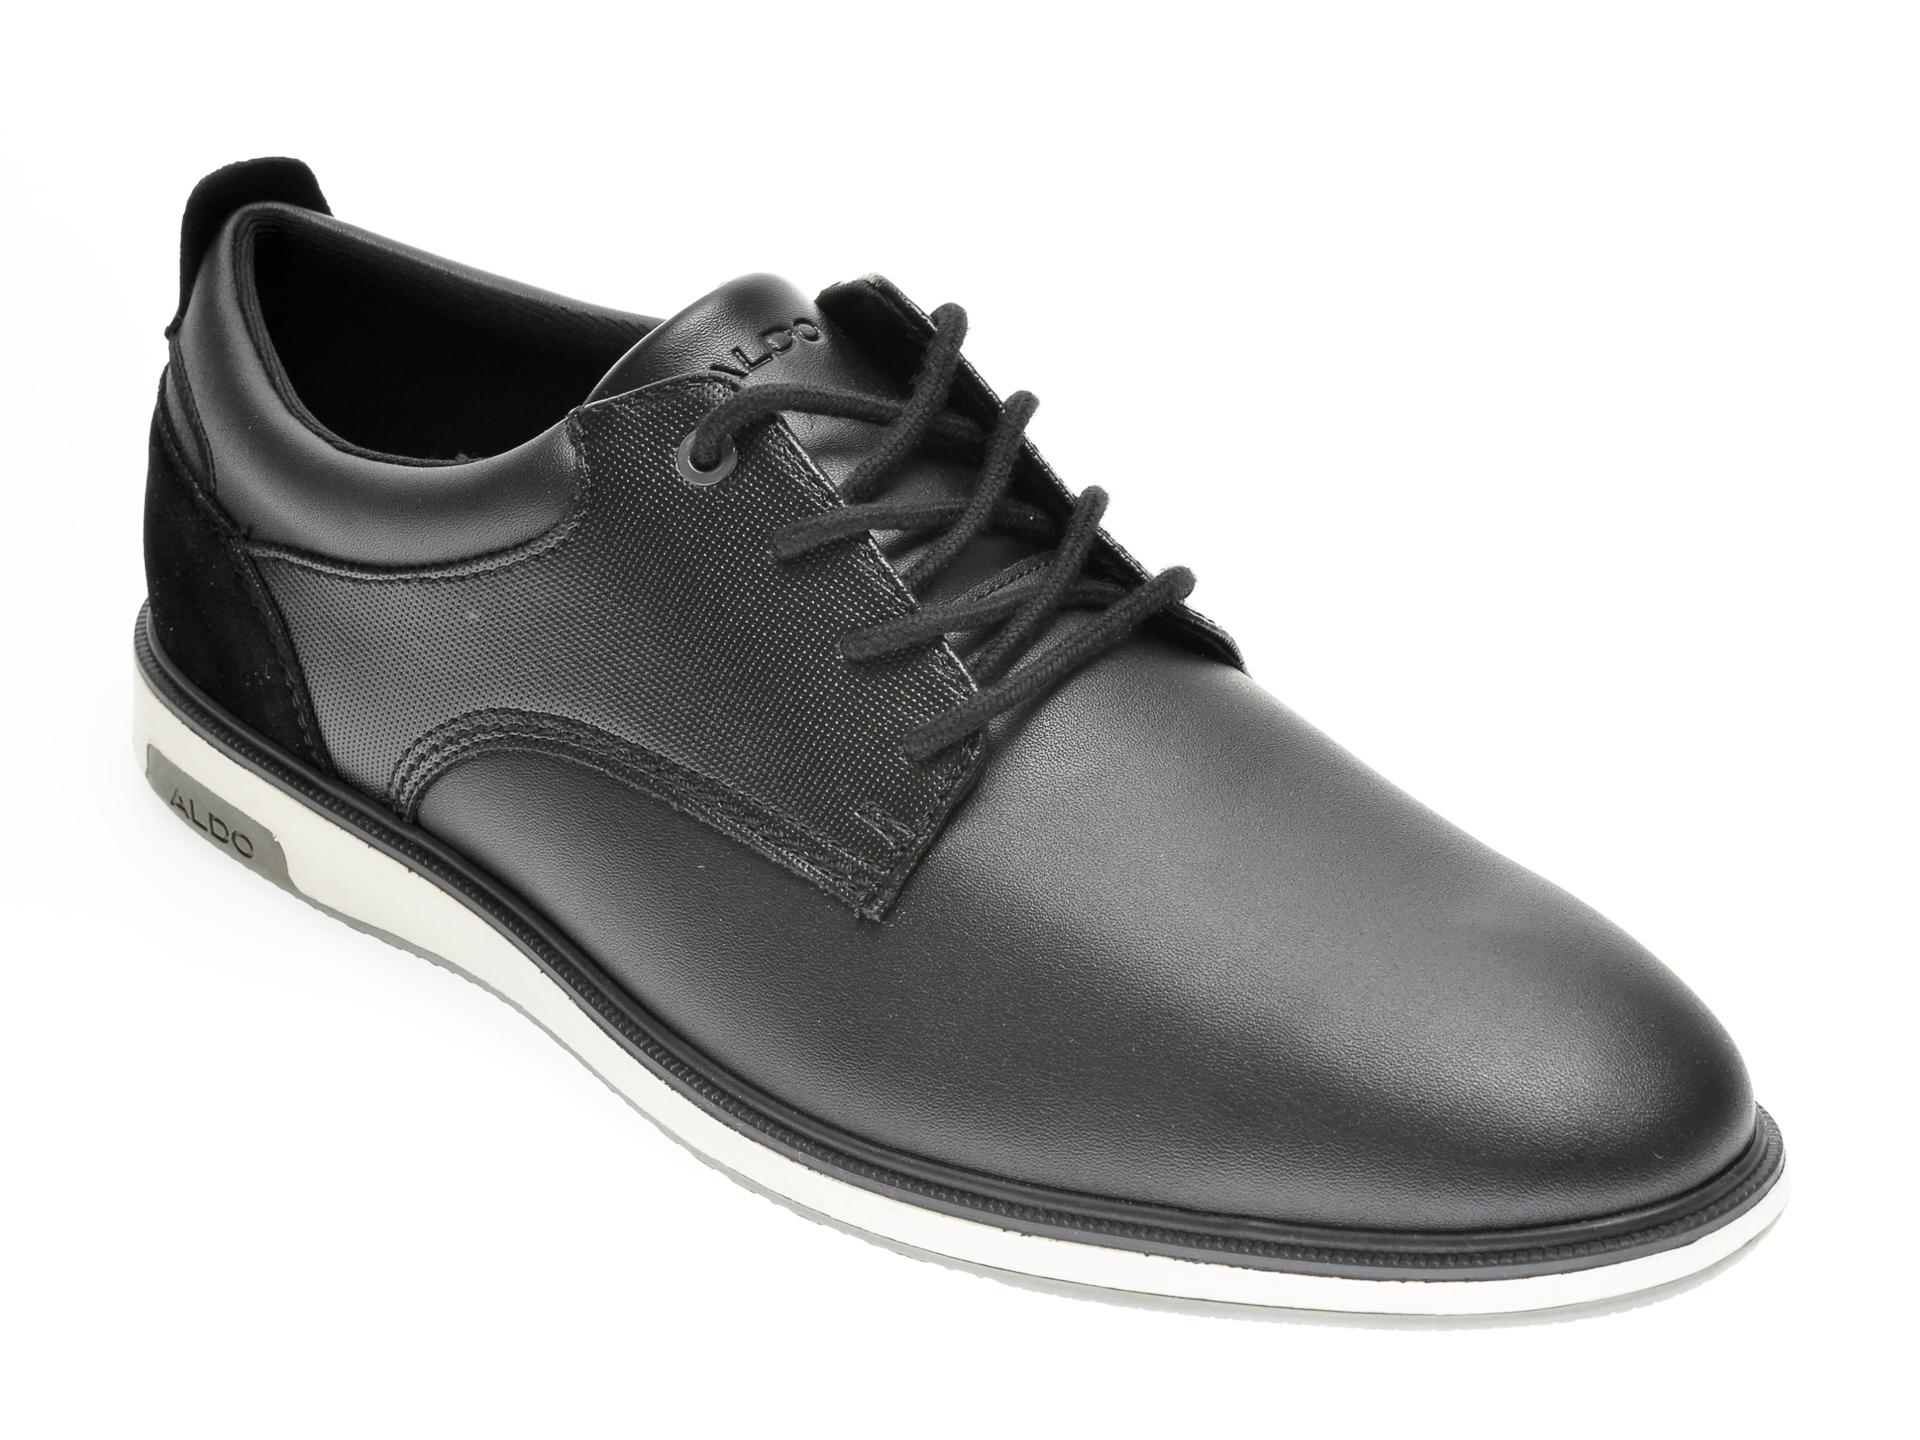 Pantofi ALDO negri, Metropole001, din piele naturala